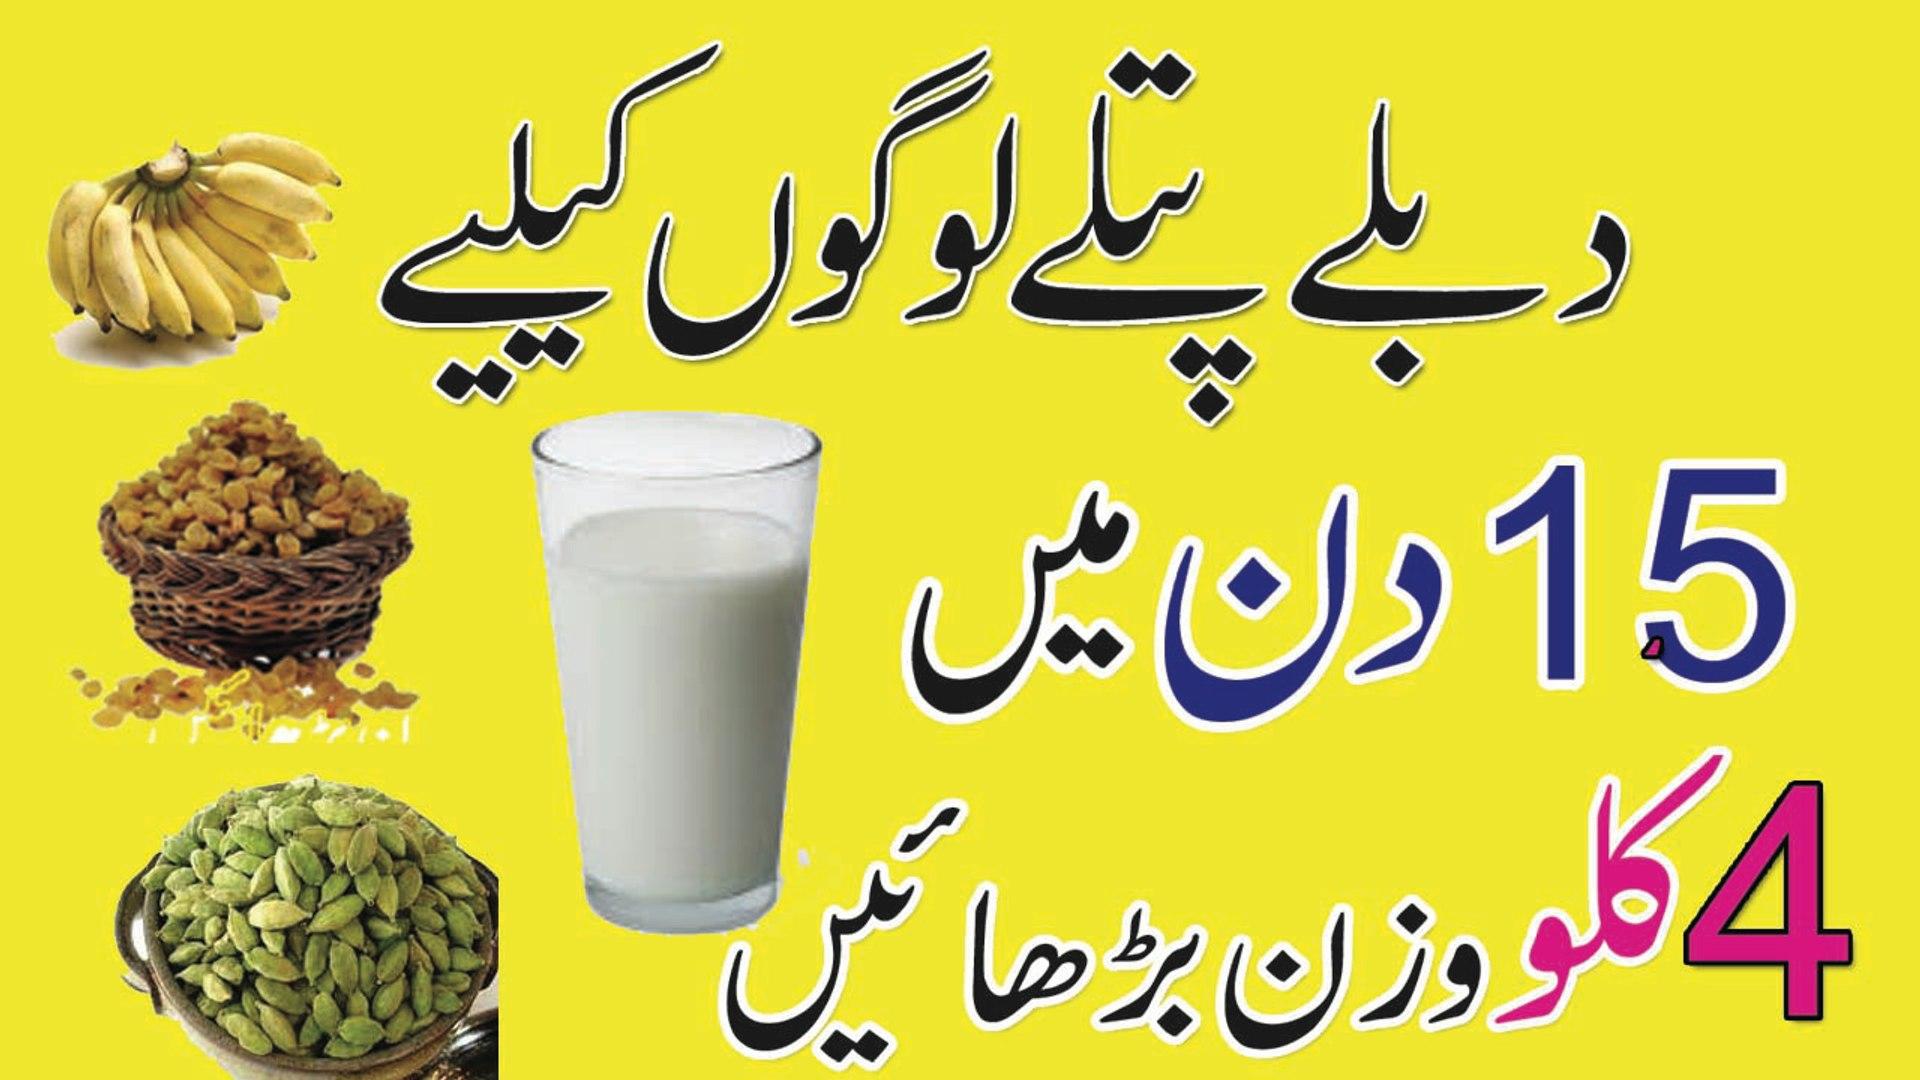 Gain Weight Tips In Urdu Remedy To Gain Weight Fast Naturally For Men Women Video Dailymotion